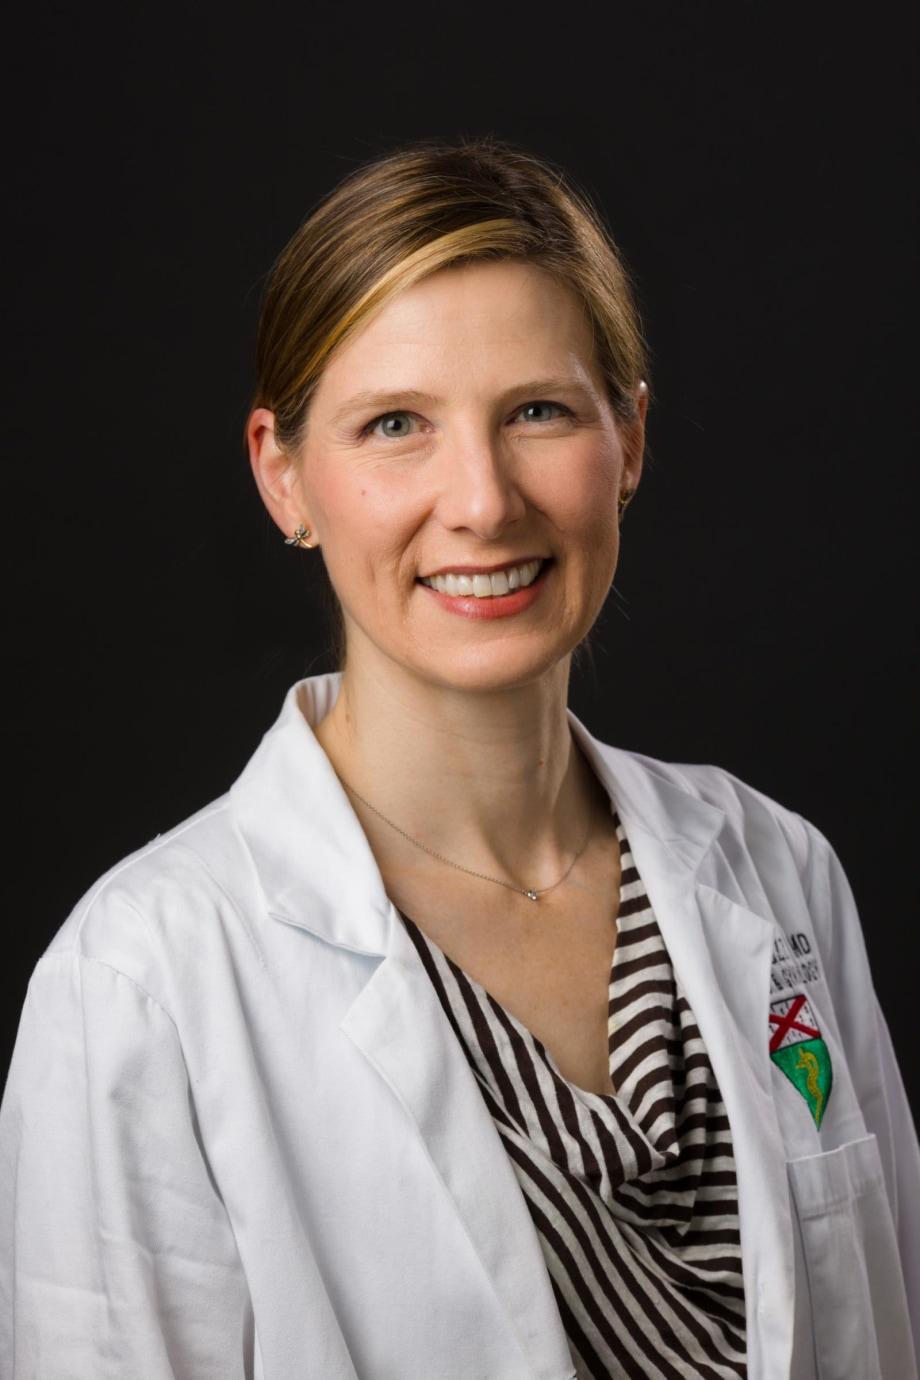 Dr. Jessica Illuzzi